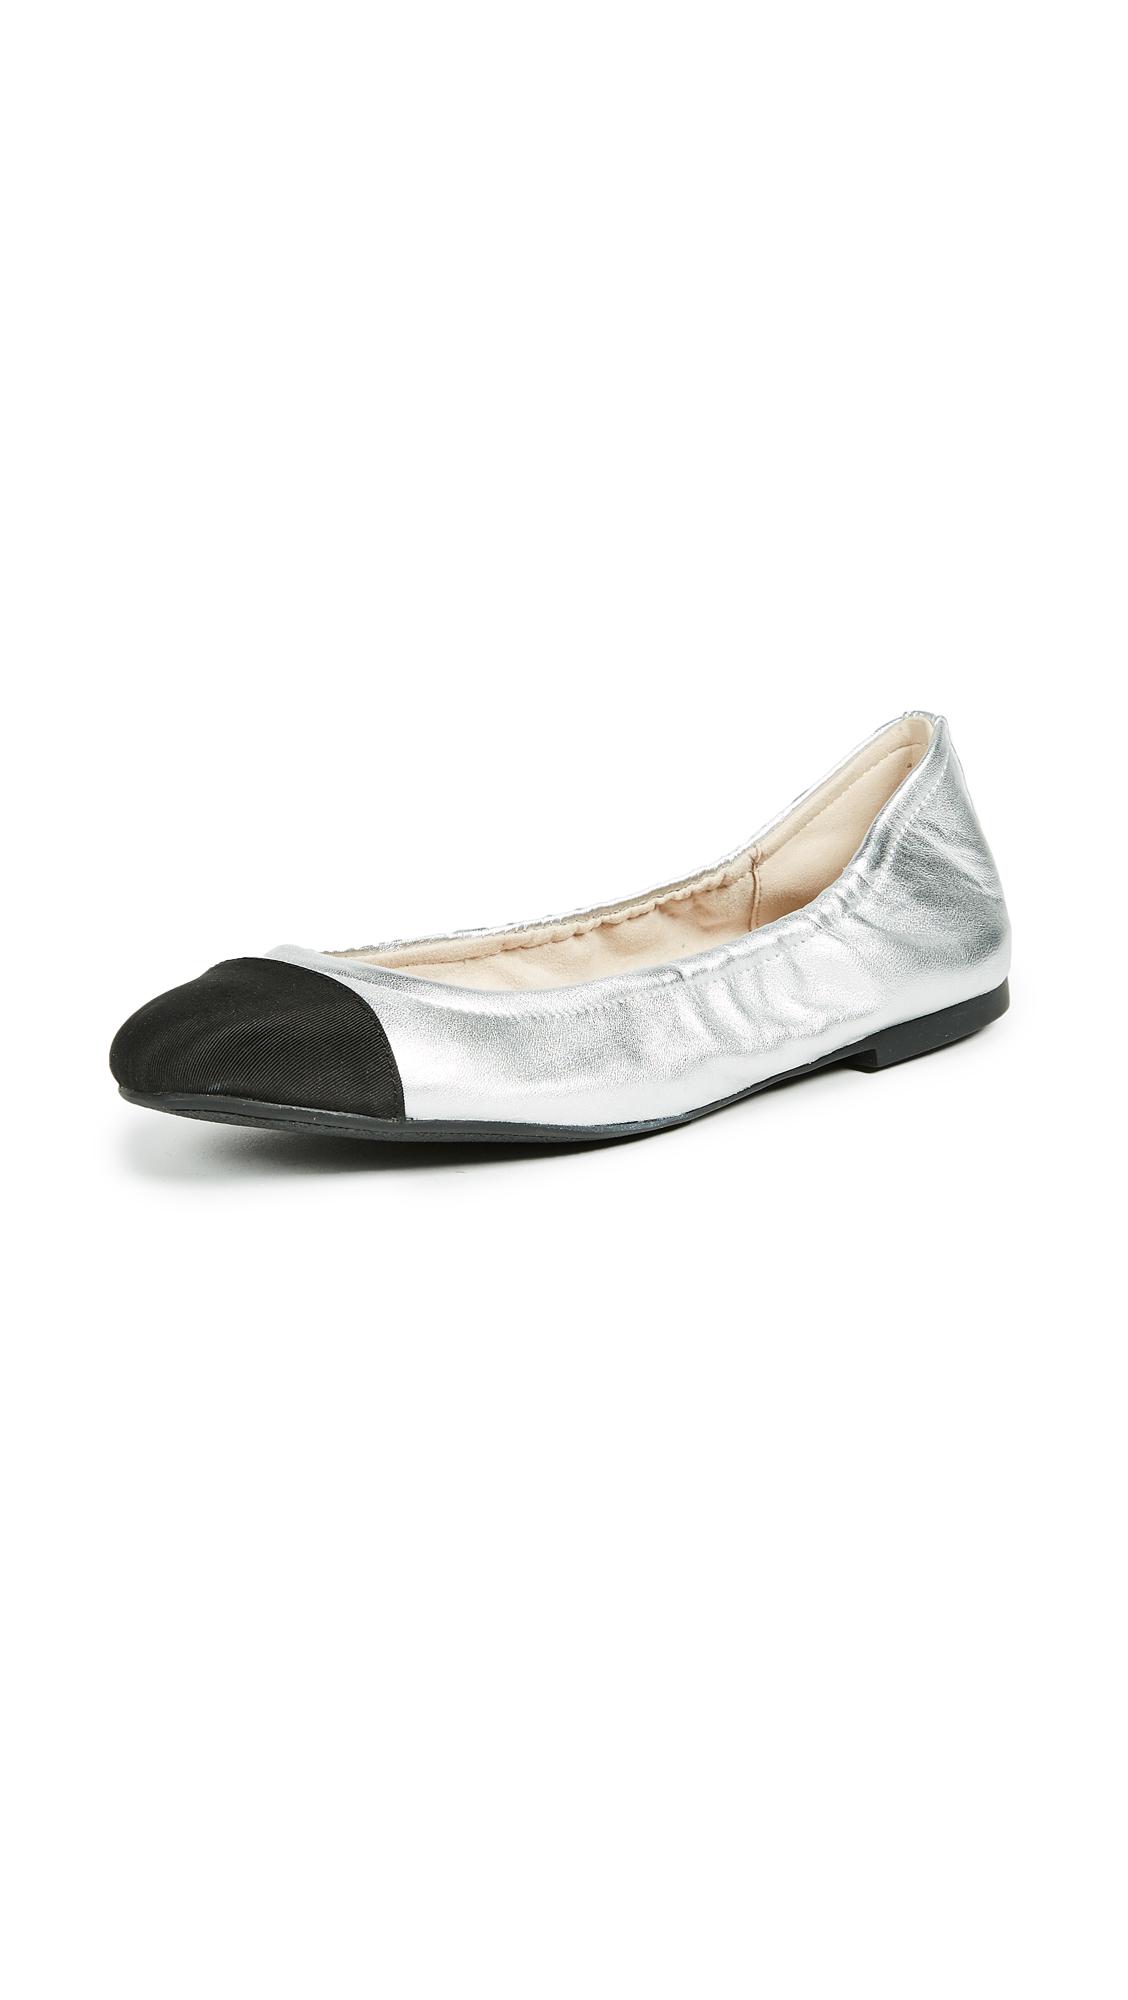 Sam Edelman Fraley Flats - Soft Silver/Black